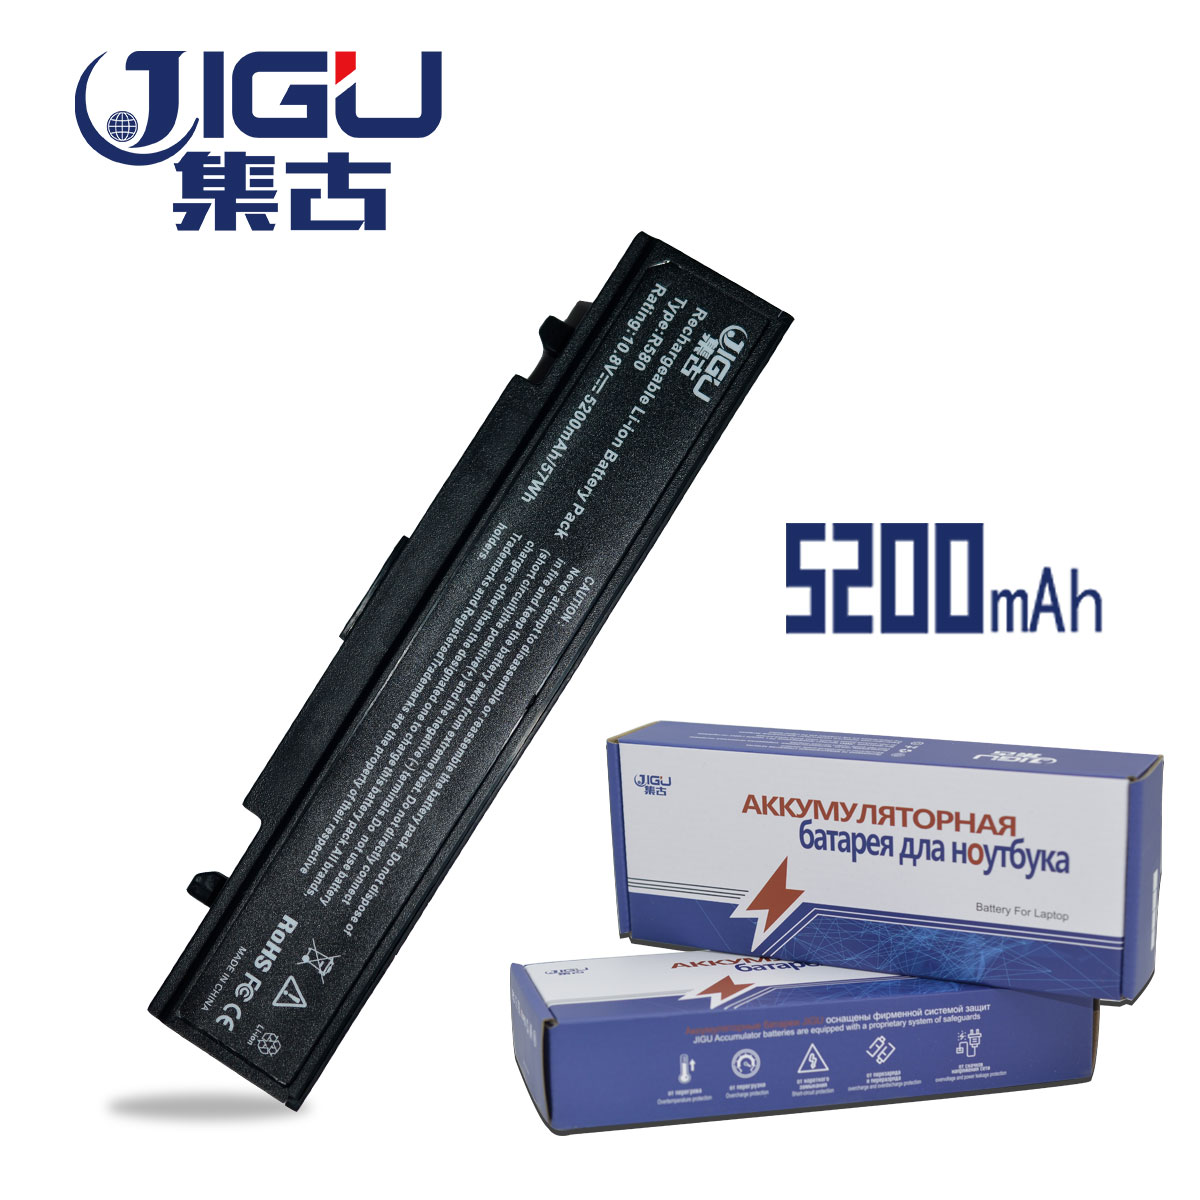 JIGU 6CELLS Laptop Battery AA-PB9NC6B PB9NC6B For SamSung R580 R468 R470 R478 R480 new laptop c shell cover for samsung r478 r480 ba75 0411b